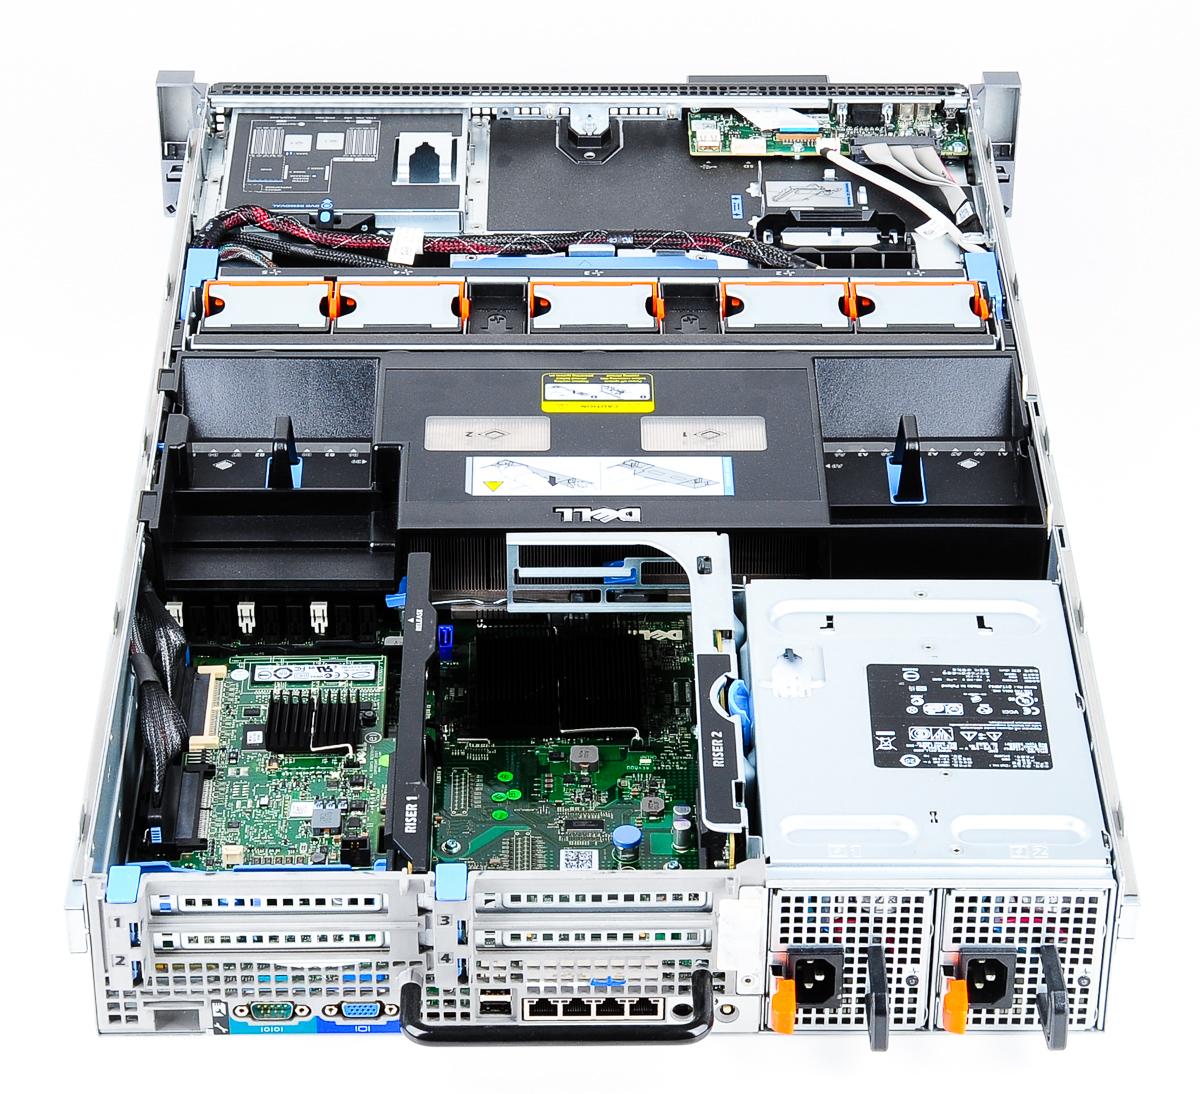 DELL PowerEdge R710 Server 2x Xeon E5645 Six Core 2 40 GHz